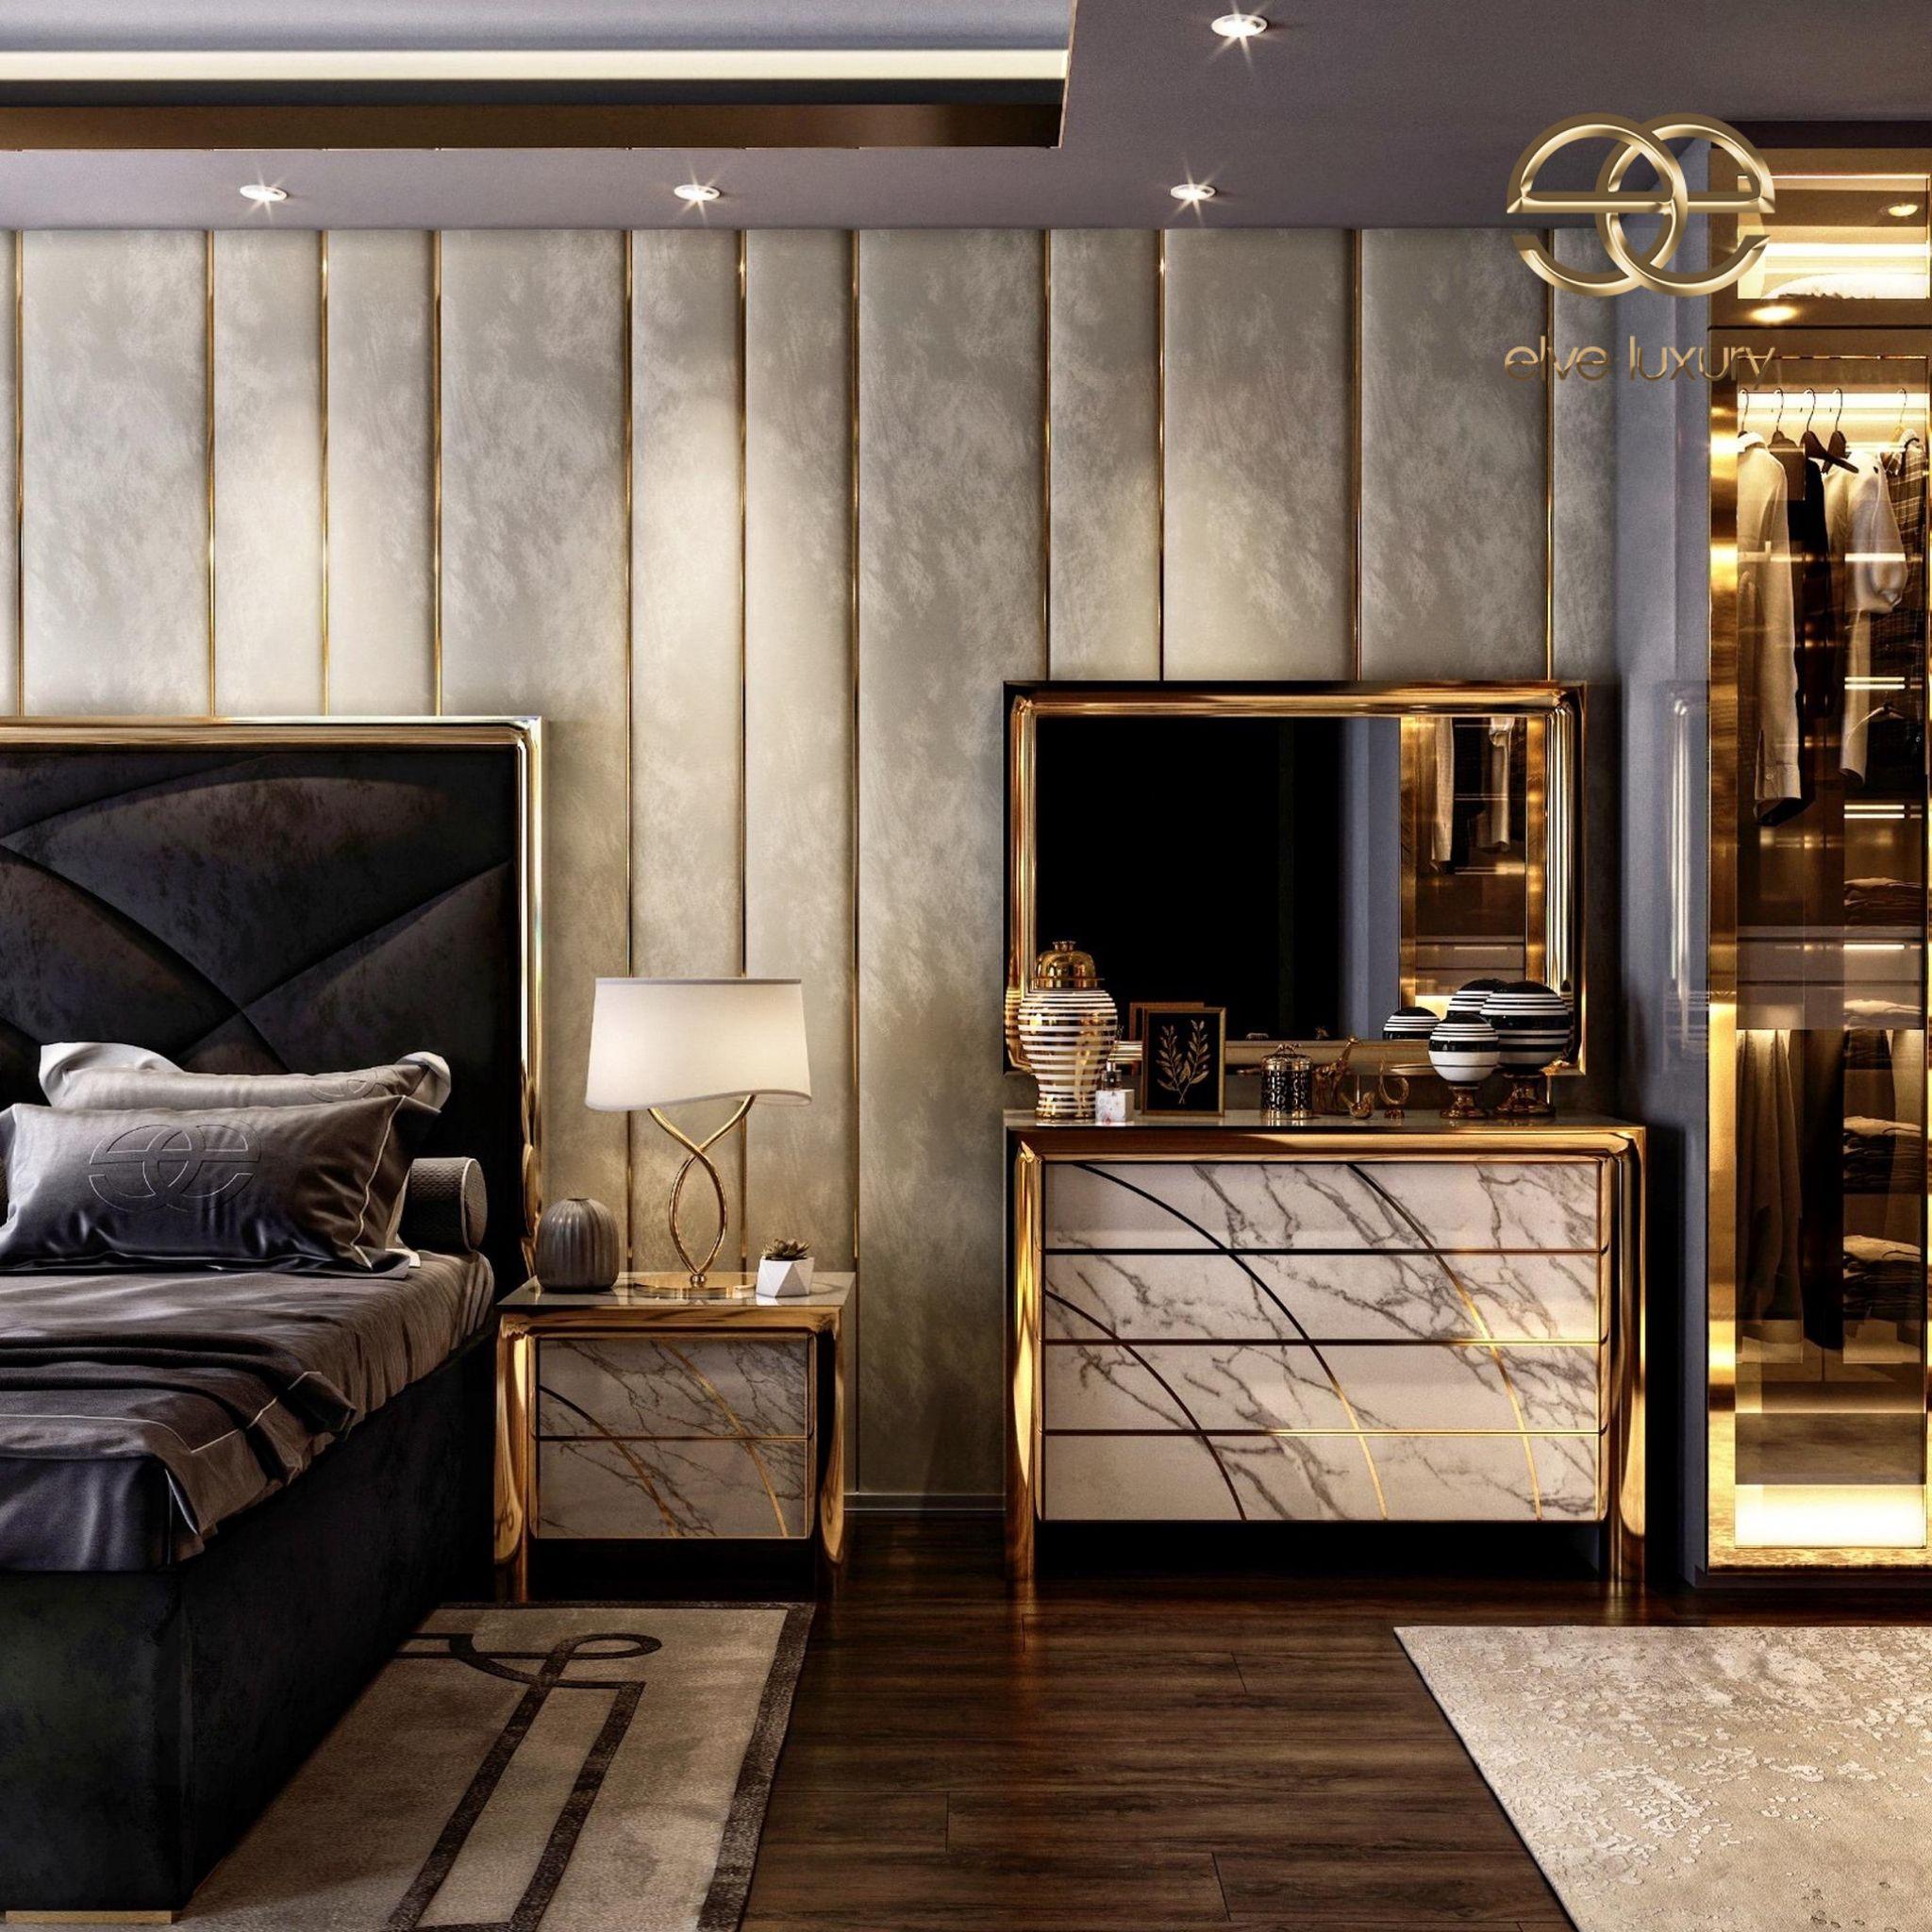 Www Elvemobilya Com Tr Luxury Luxuryfurniture Luxuryliving Luxurylife Luxurylifestyle Koltuk Bedroom Livingroom Armchair Ch In 2020 Home Home Decor Furniture